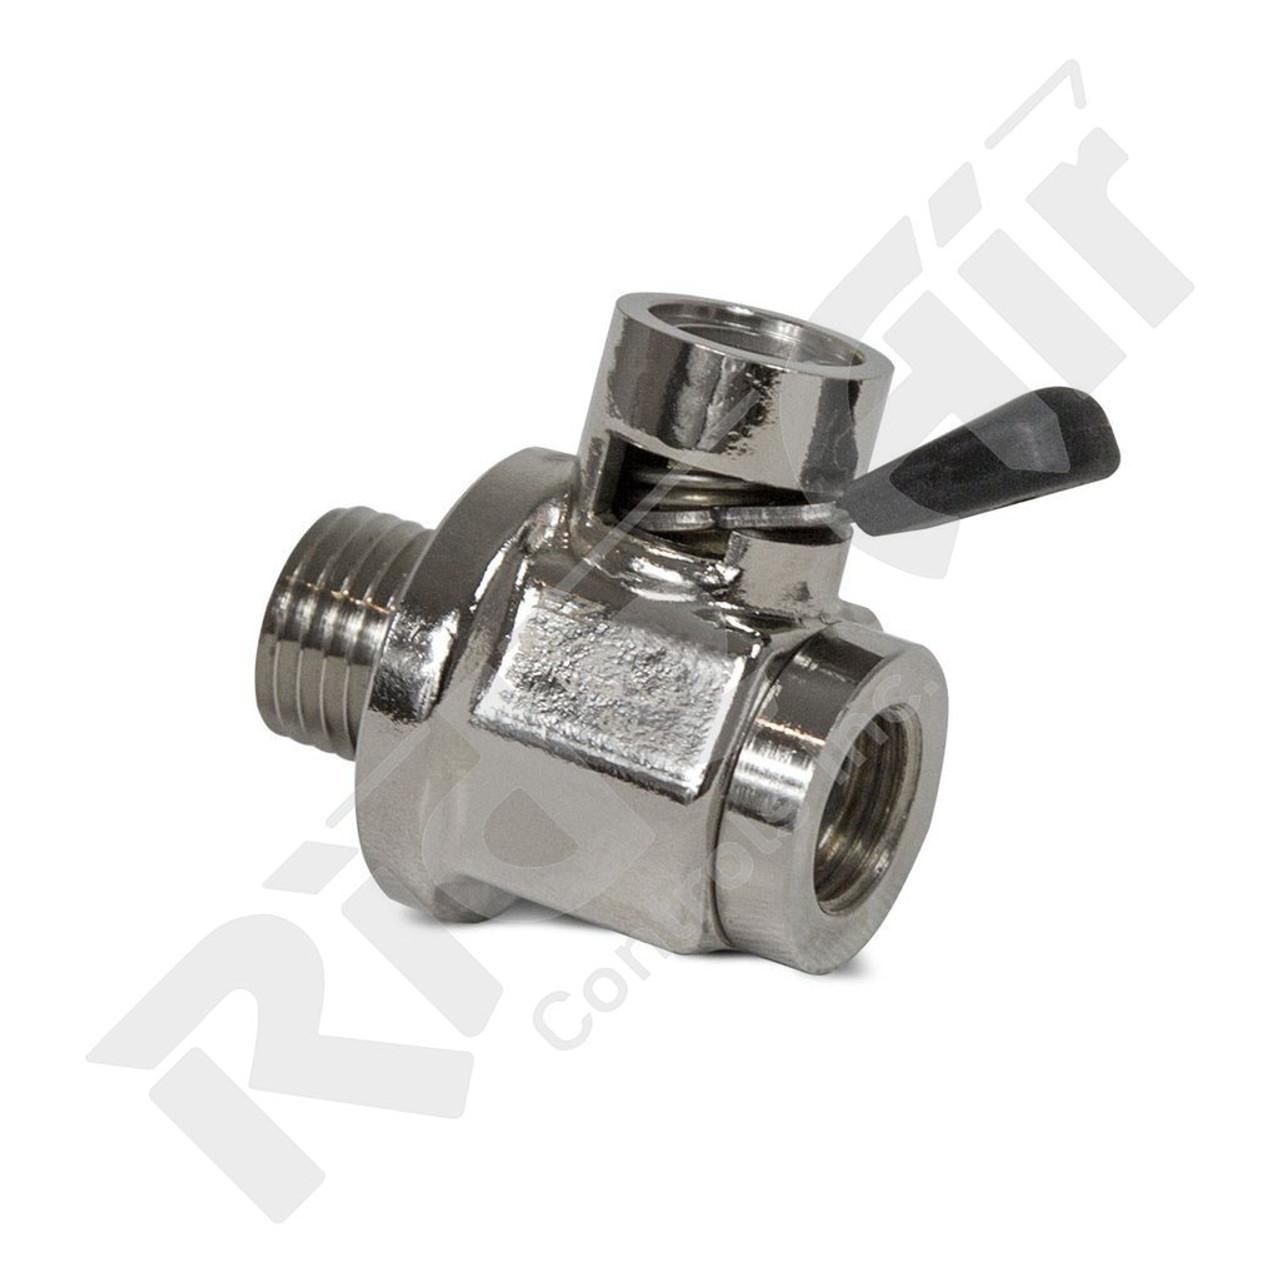 EZ-211 - EZ Oil Drain Plug (27MM - 2.0)